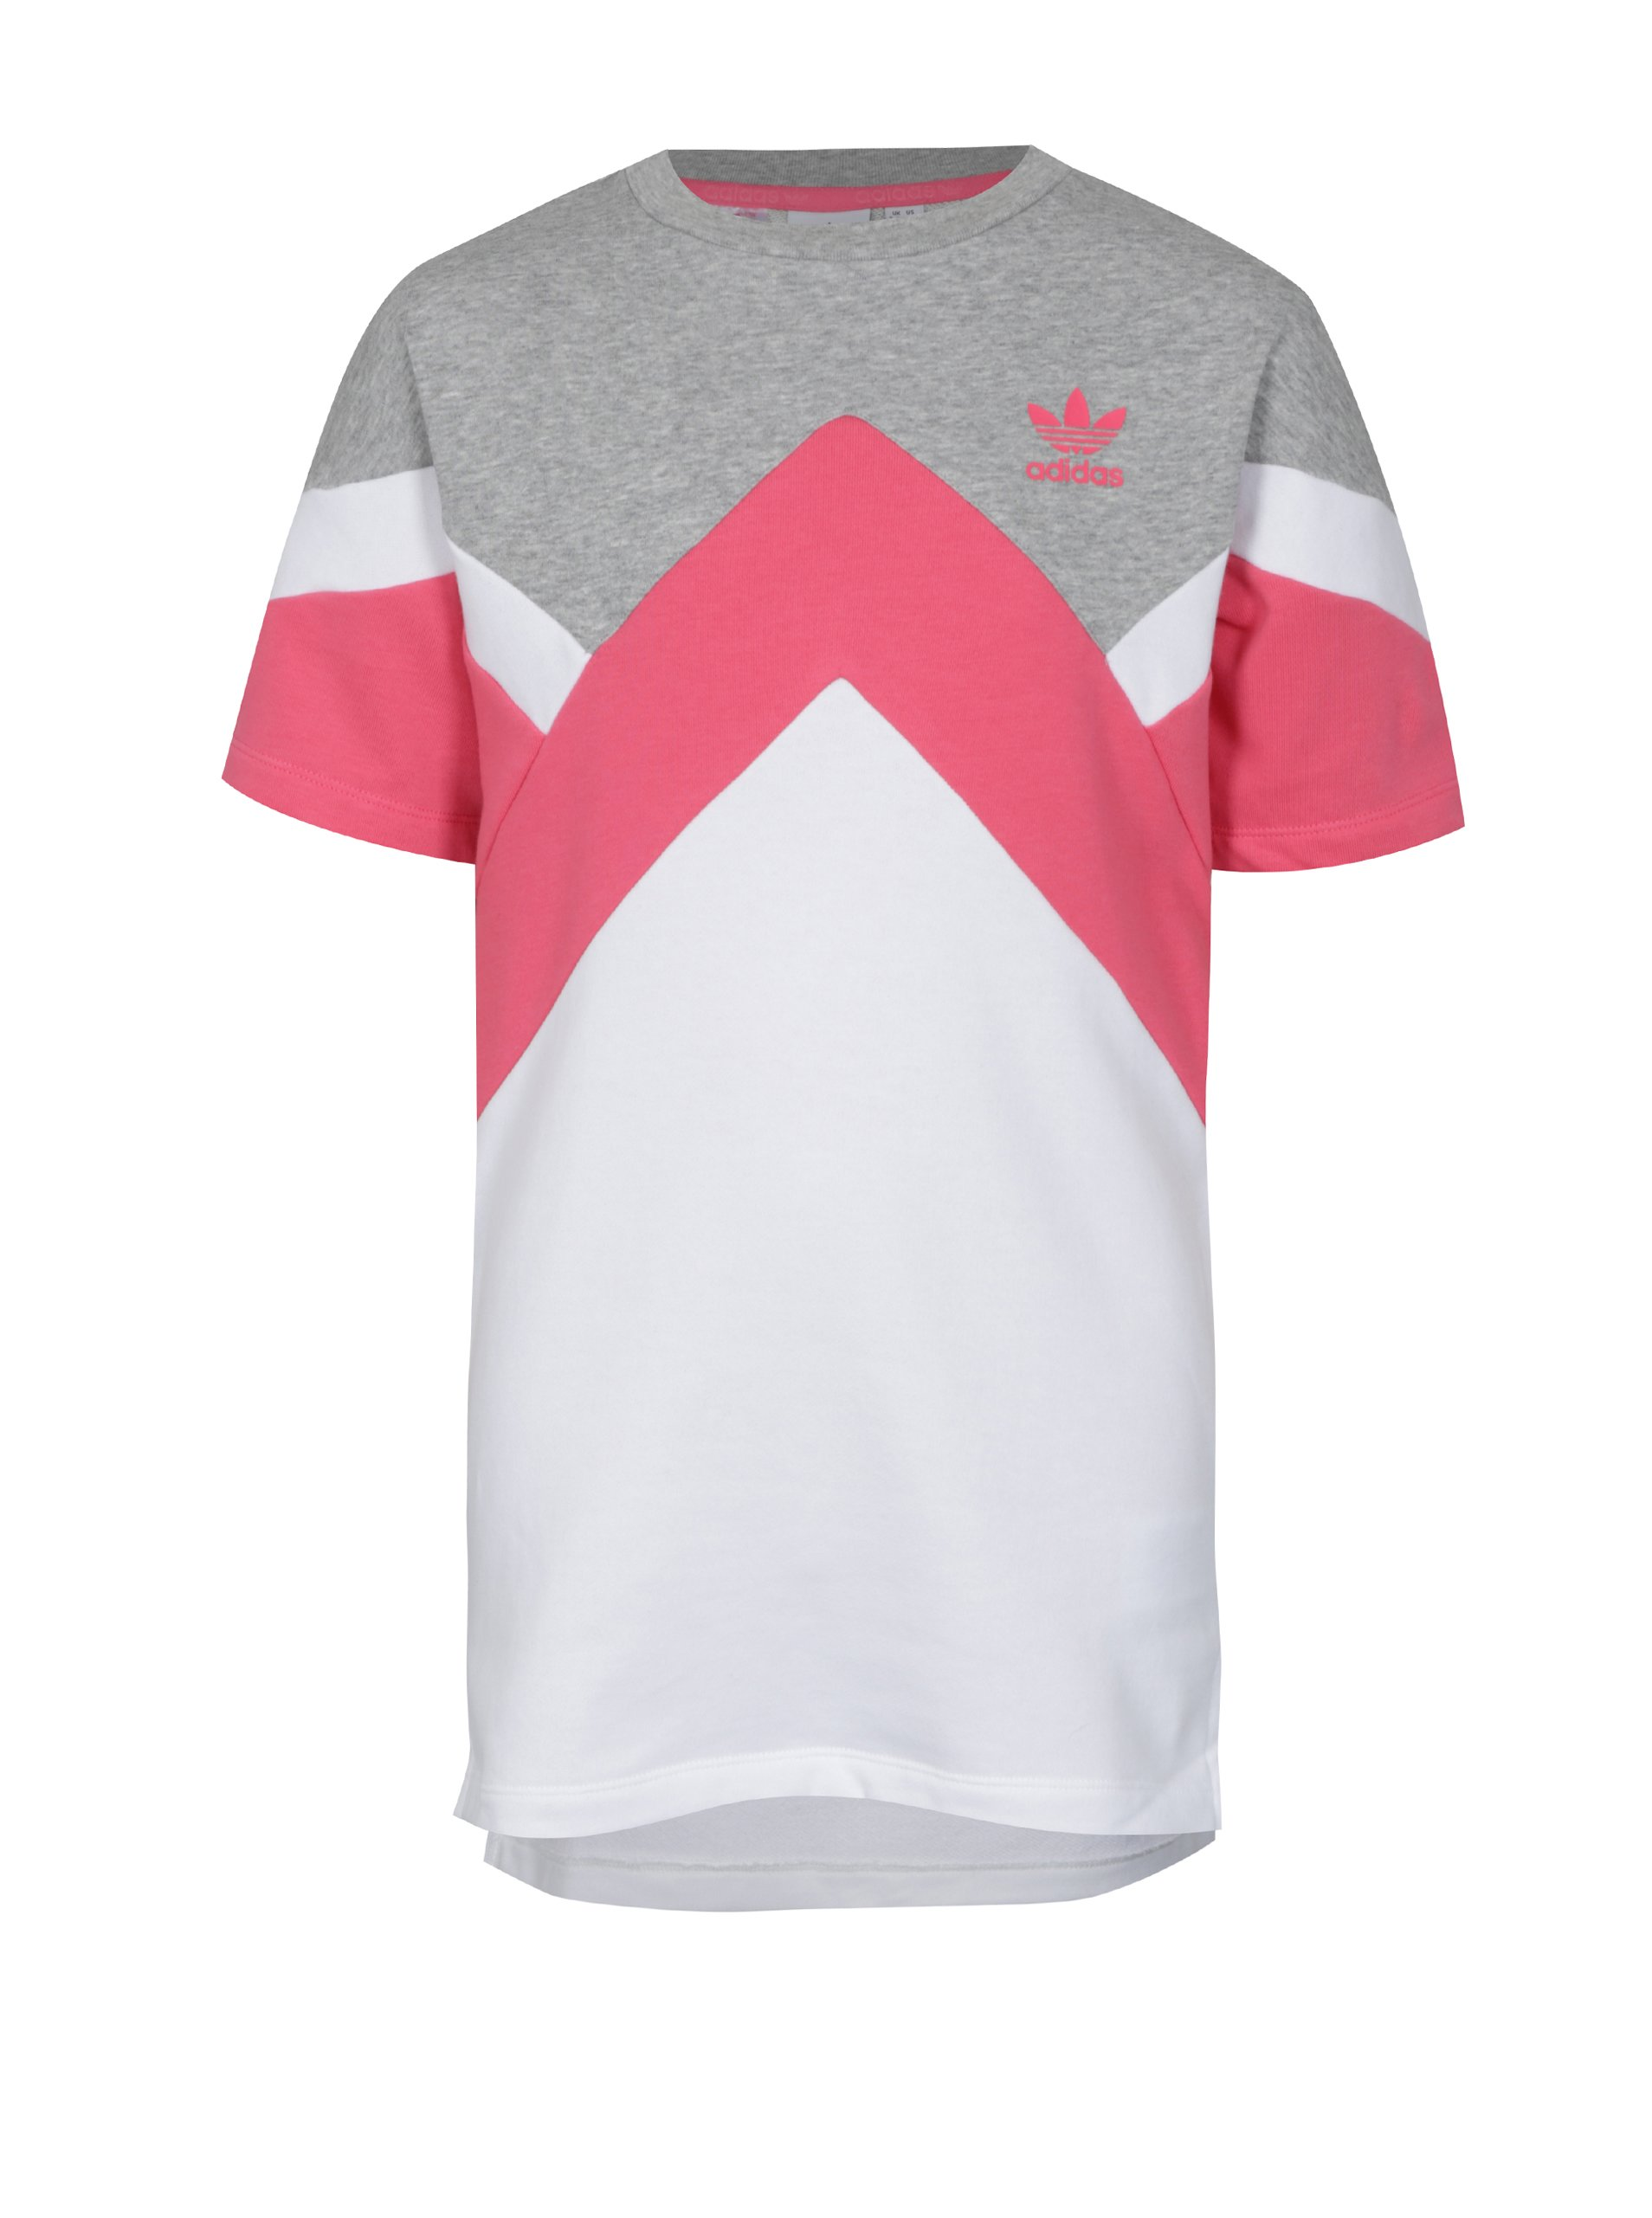 Bielo-ružové dievčenské mikinové šaty adidas Originals J M Ft Hoodie